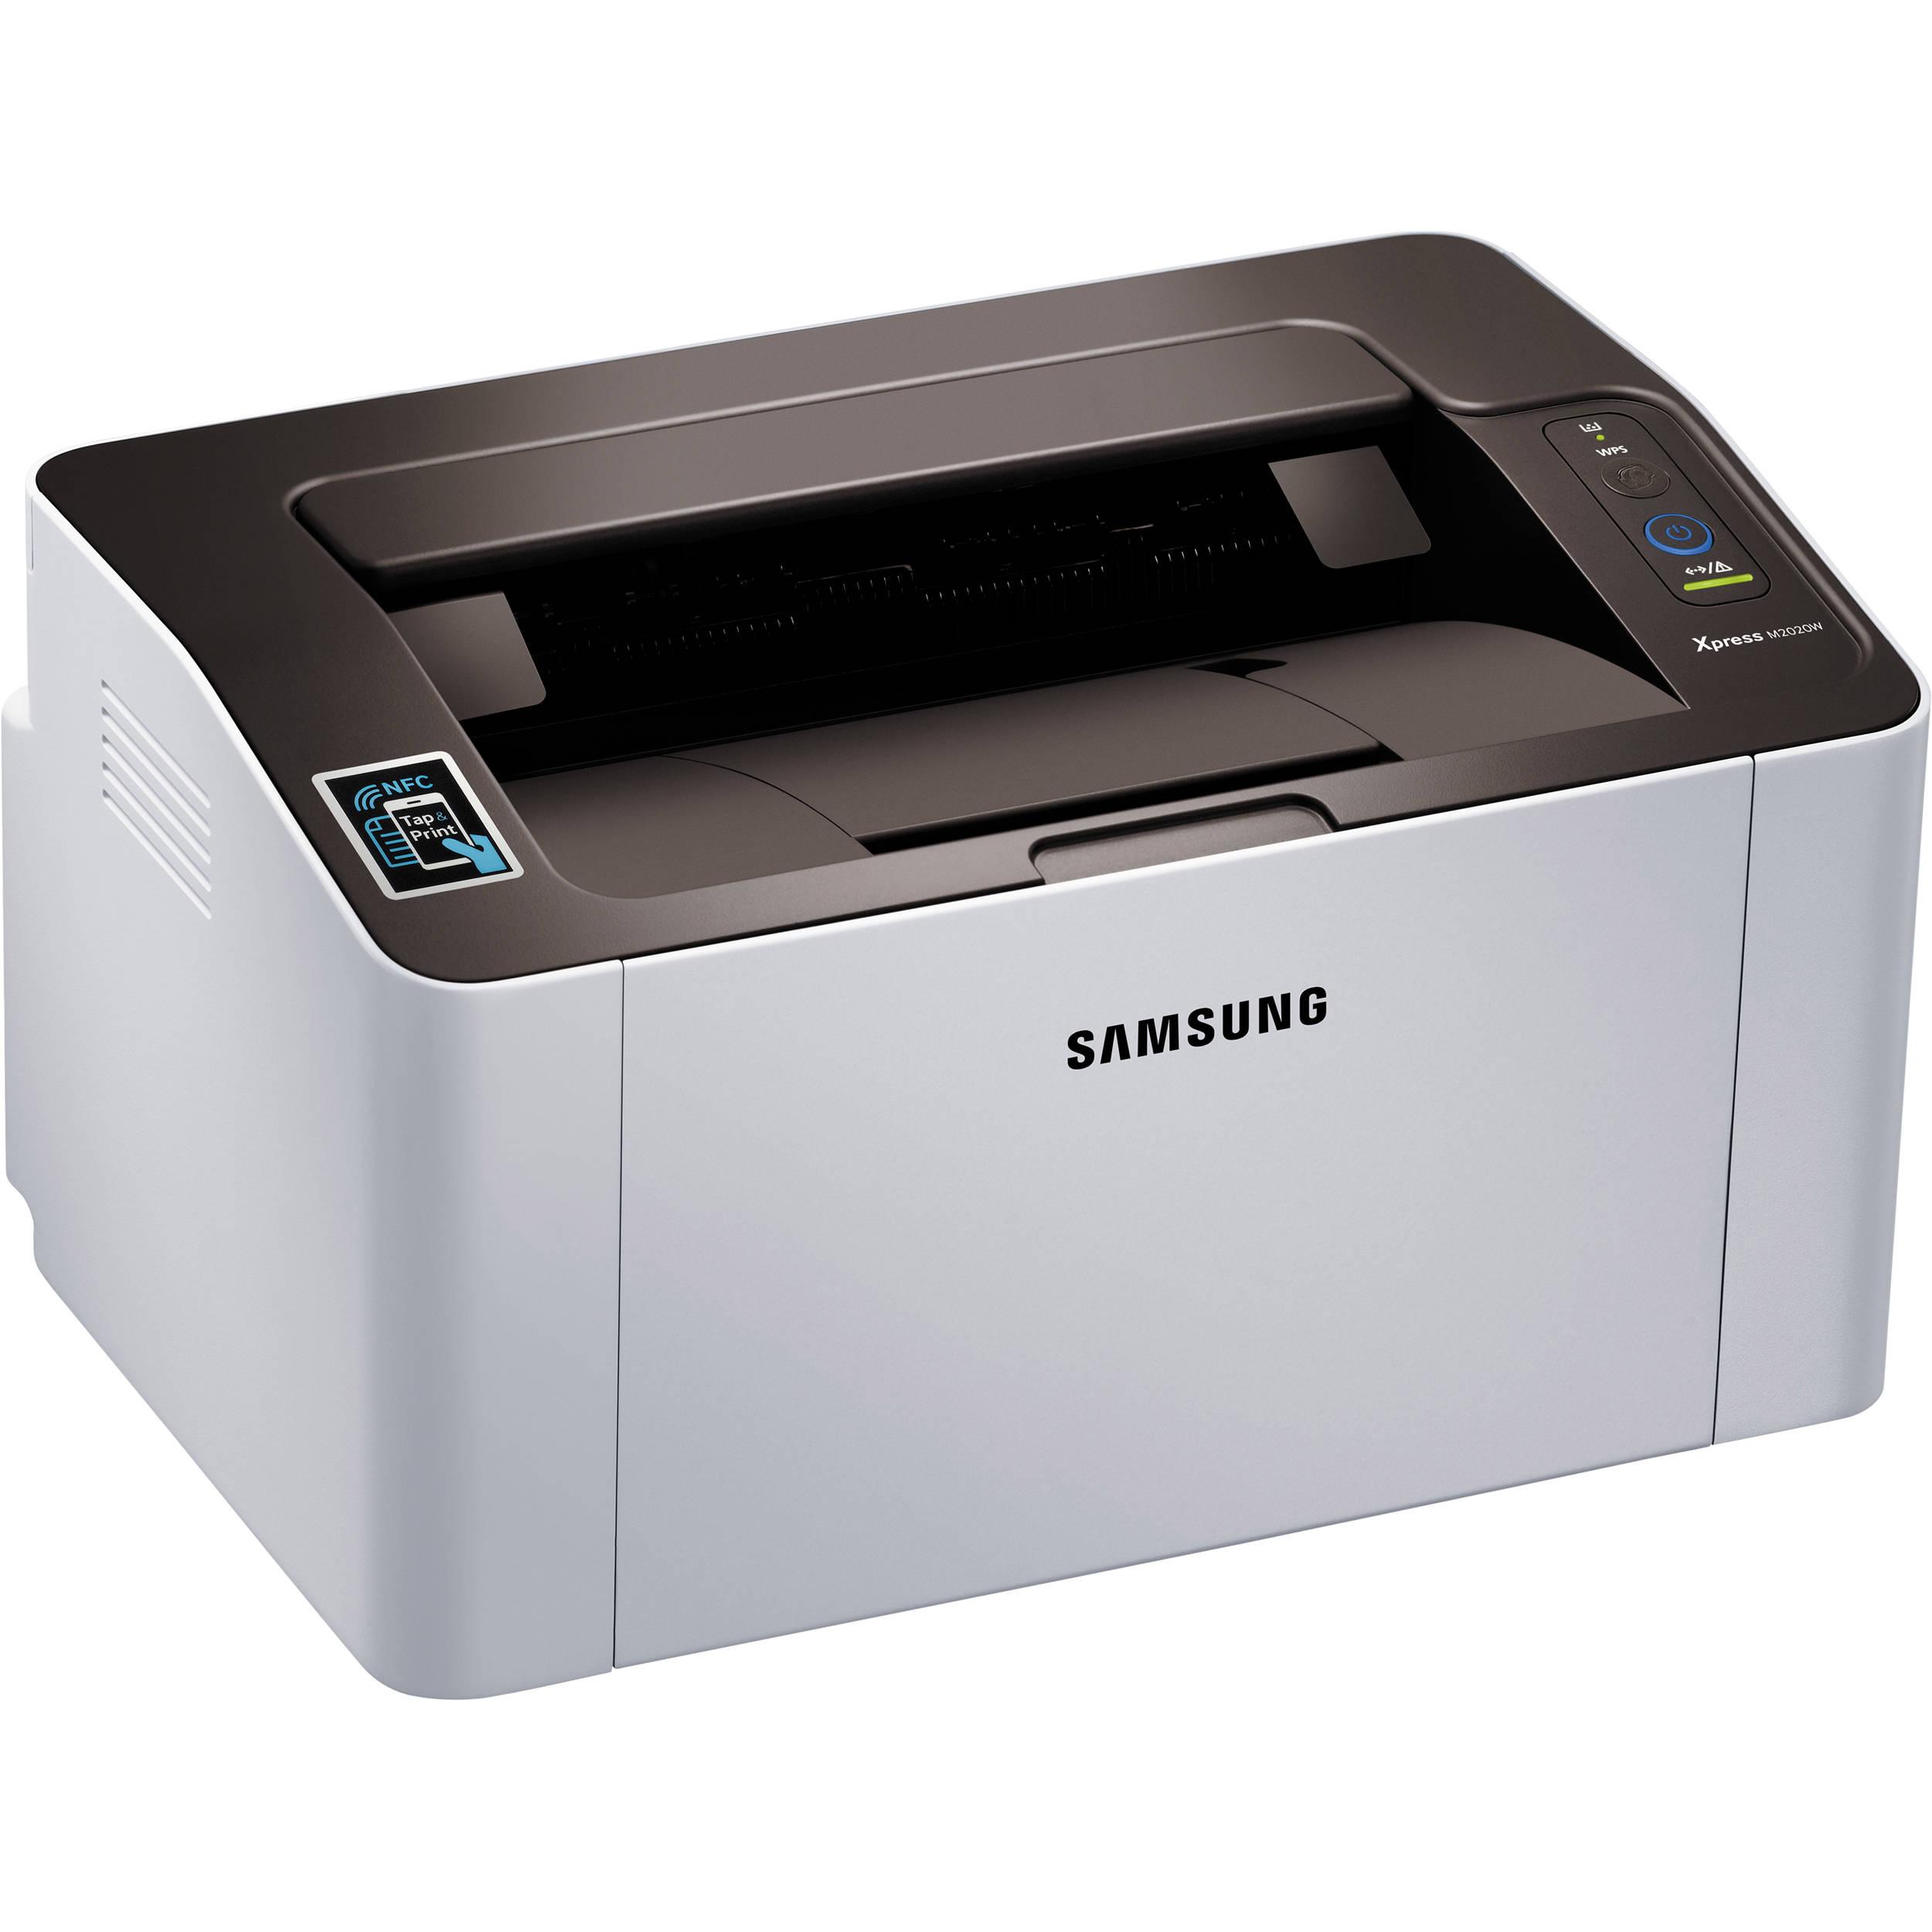 Samsung M2020w Printer Driver For Linux